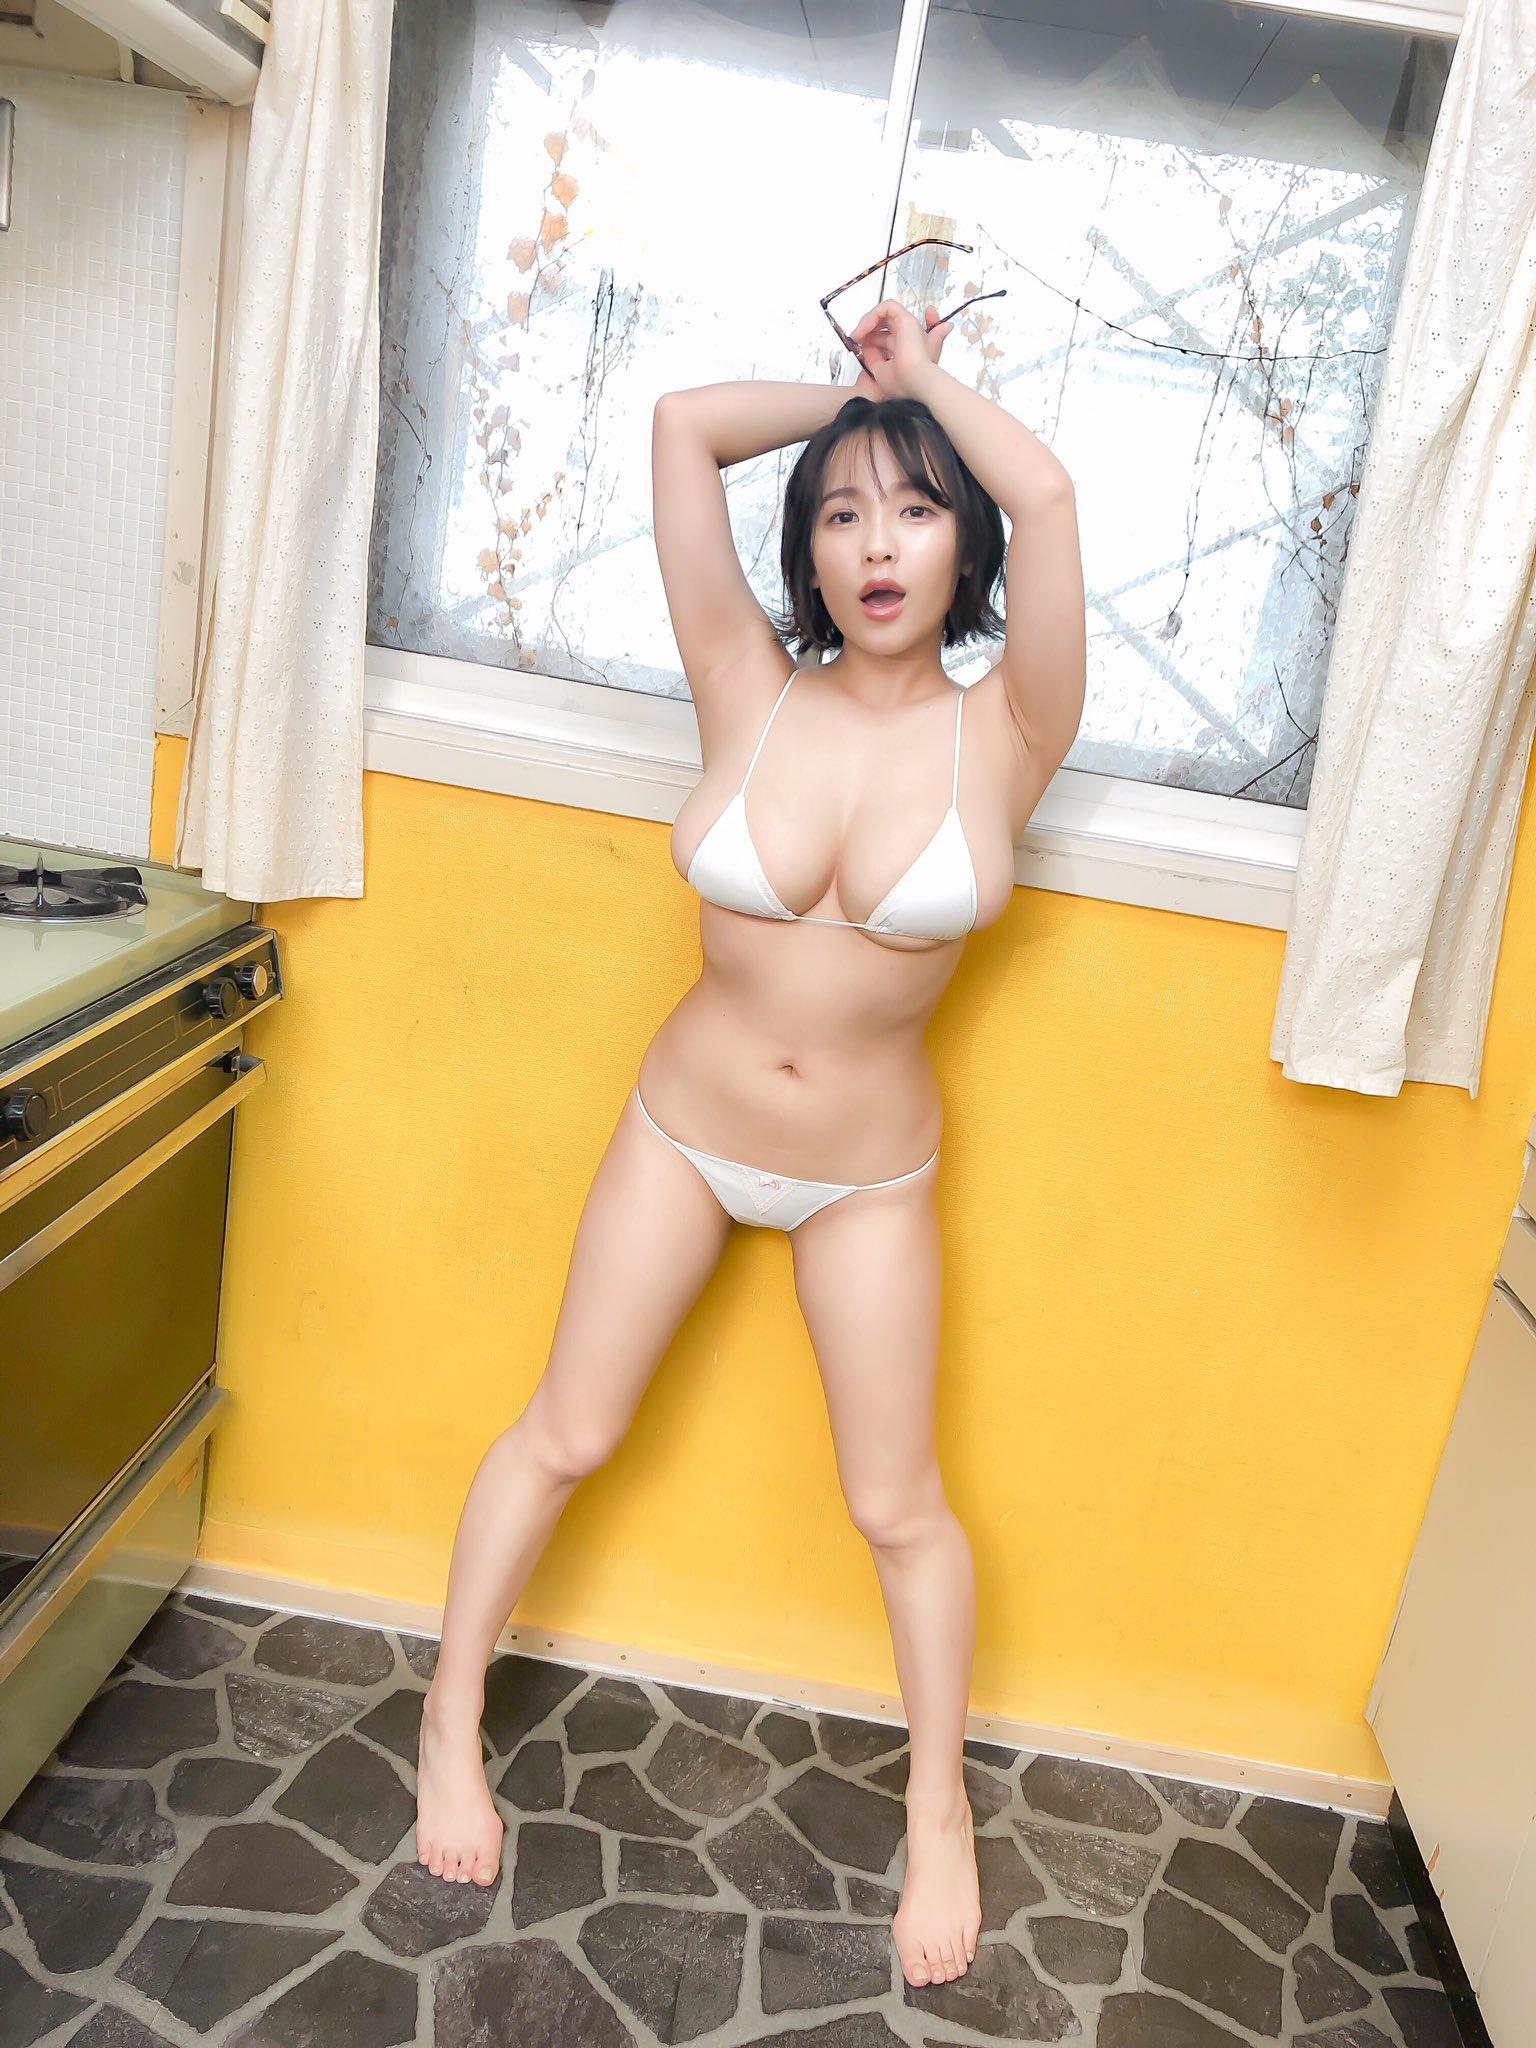 Amaki Jun